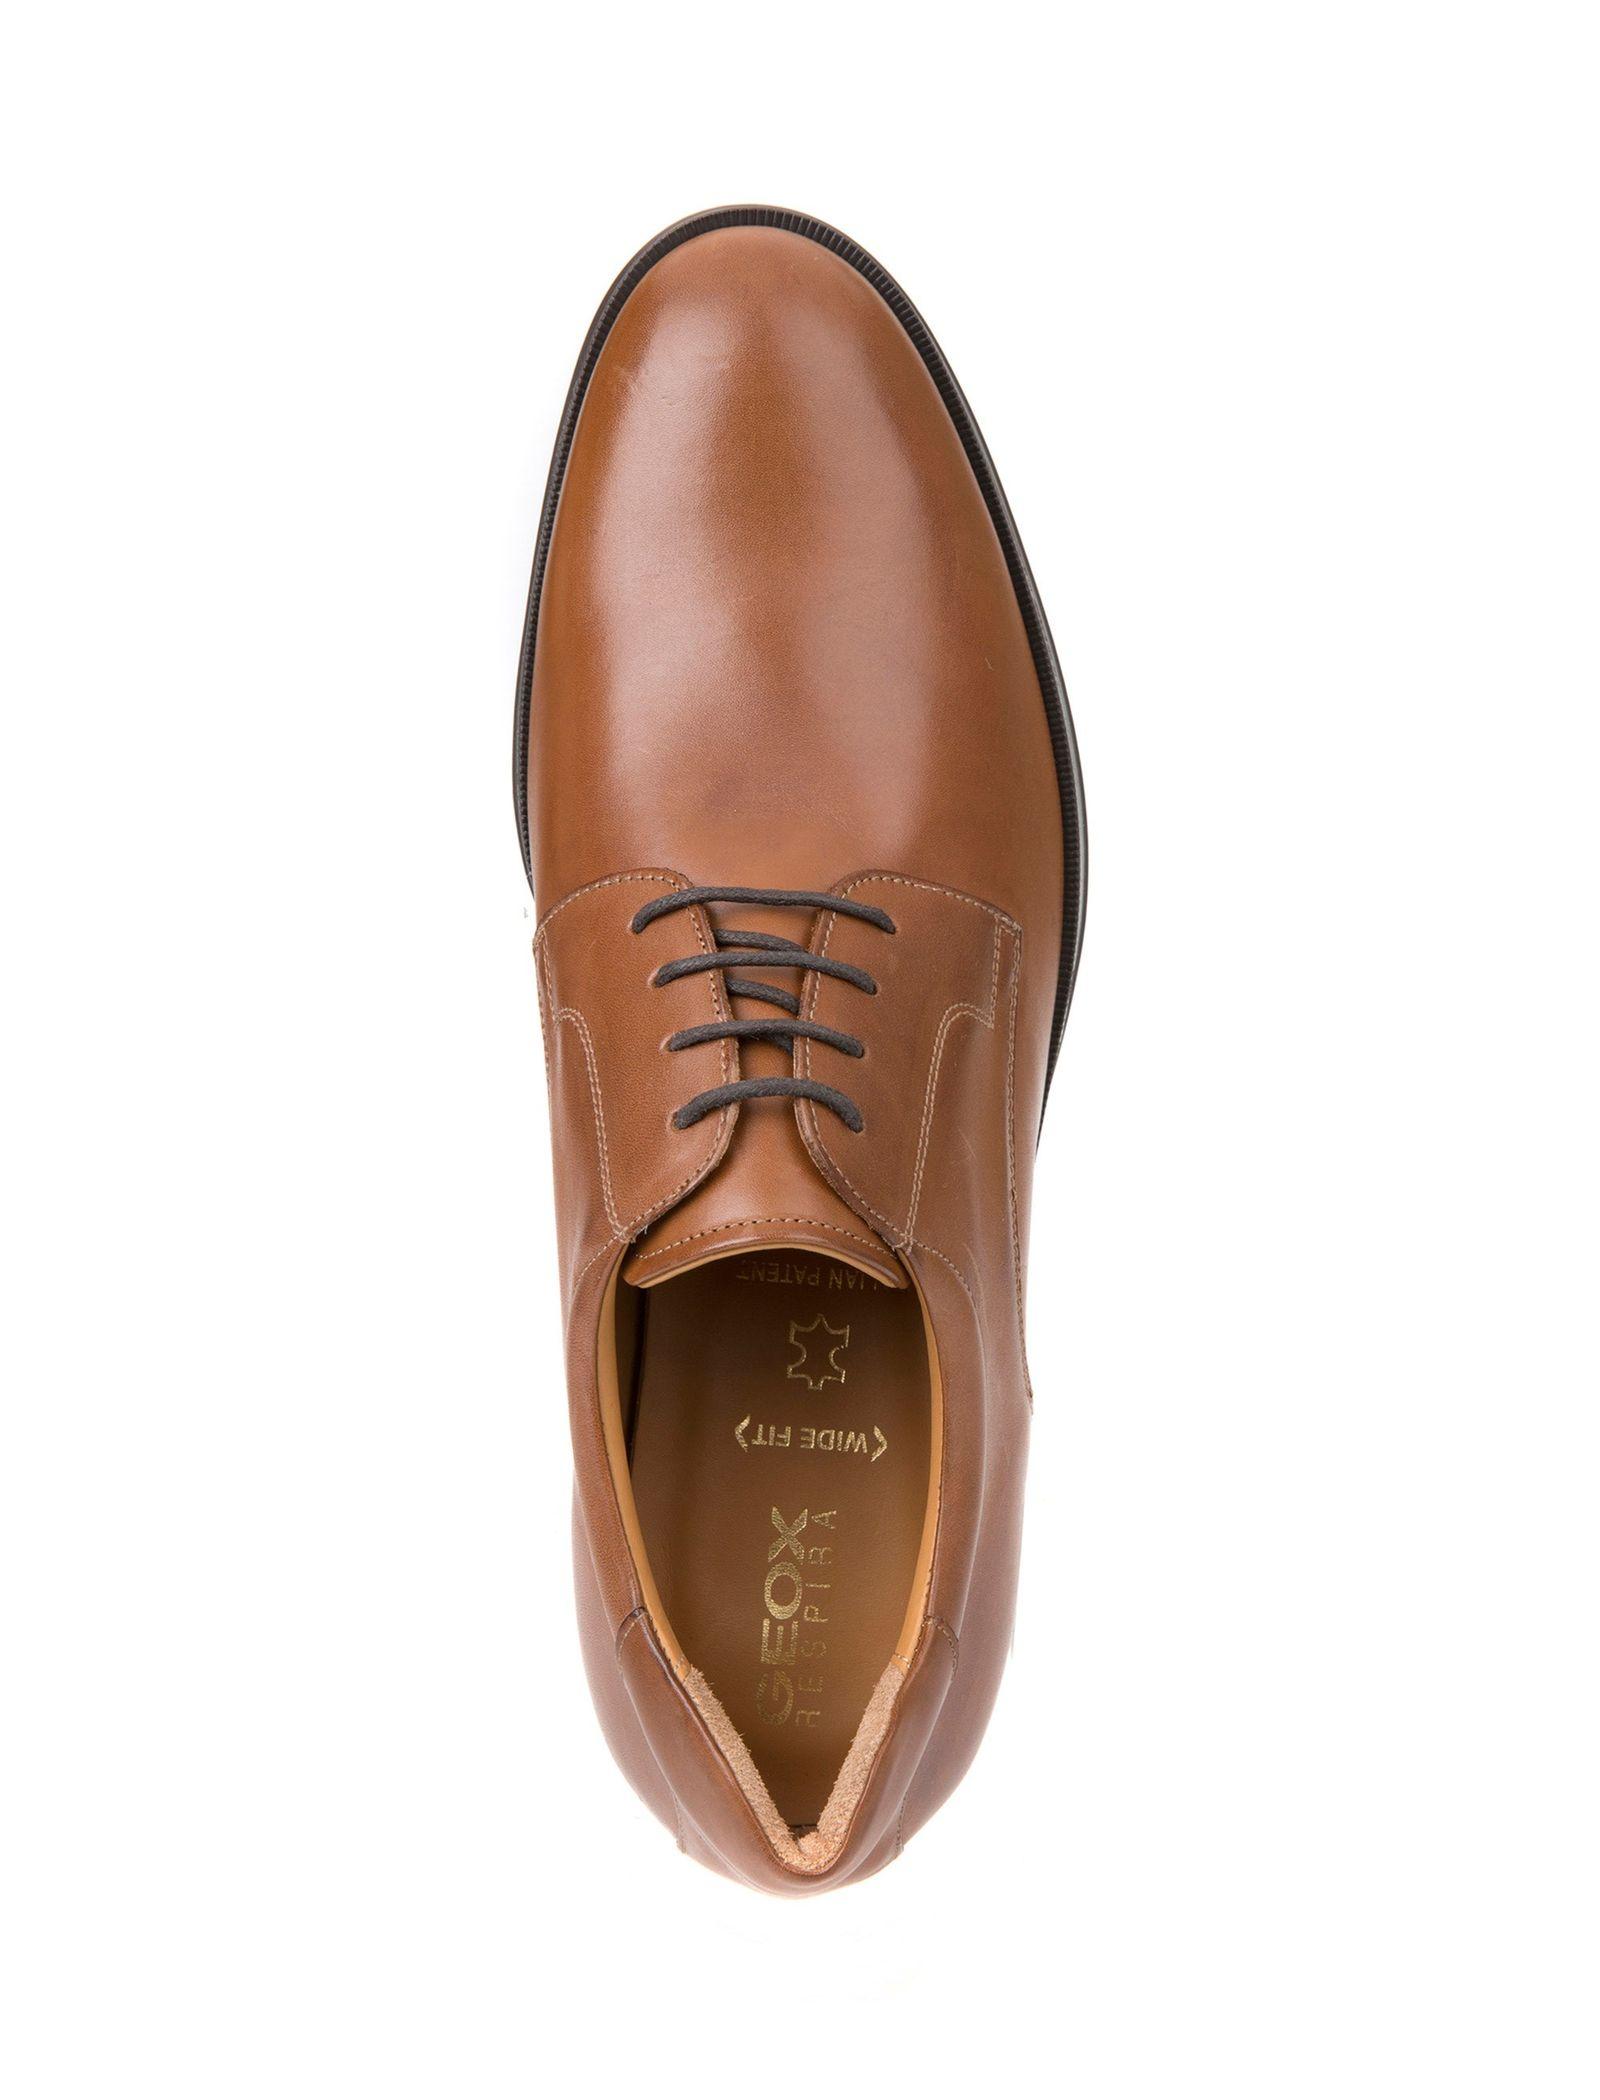 کفش اداری چرم مردانه Hilstone - جی اوکس - قهوه اي  - 2